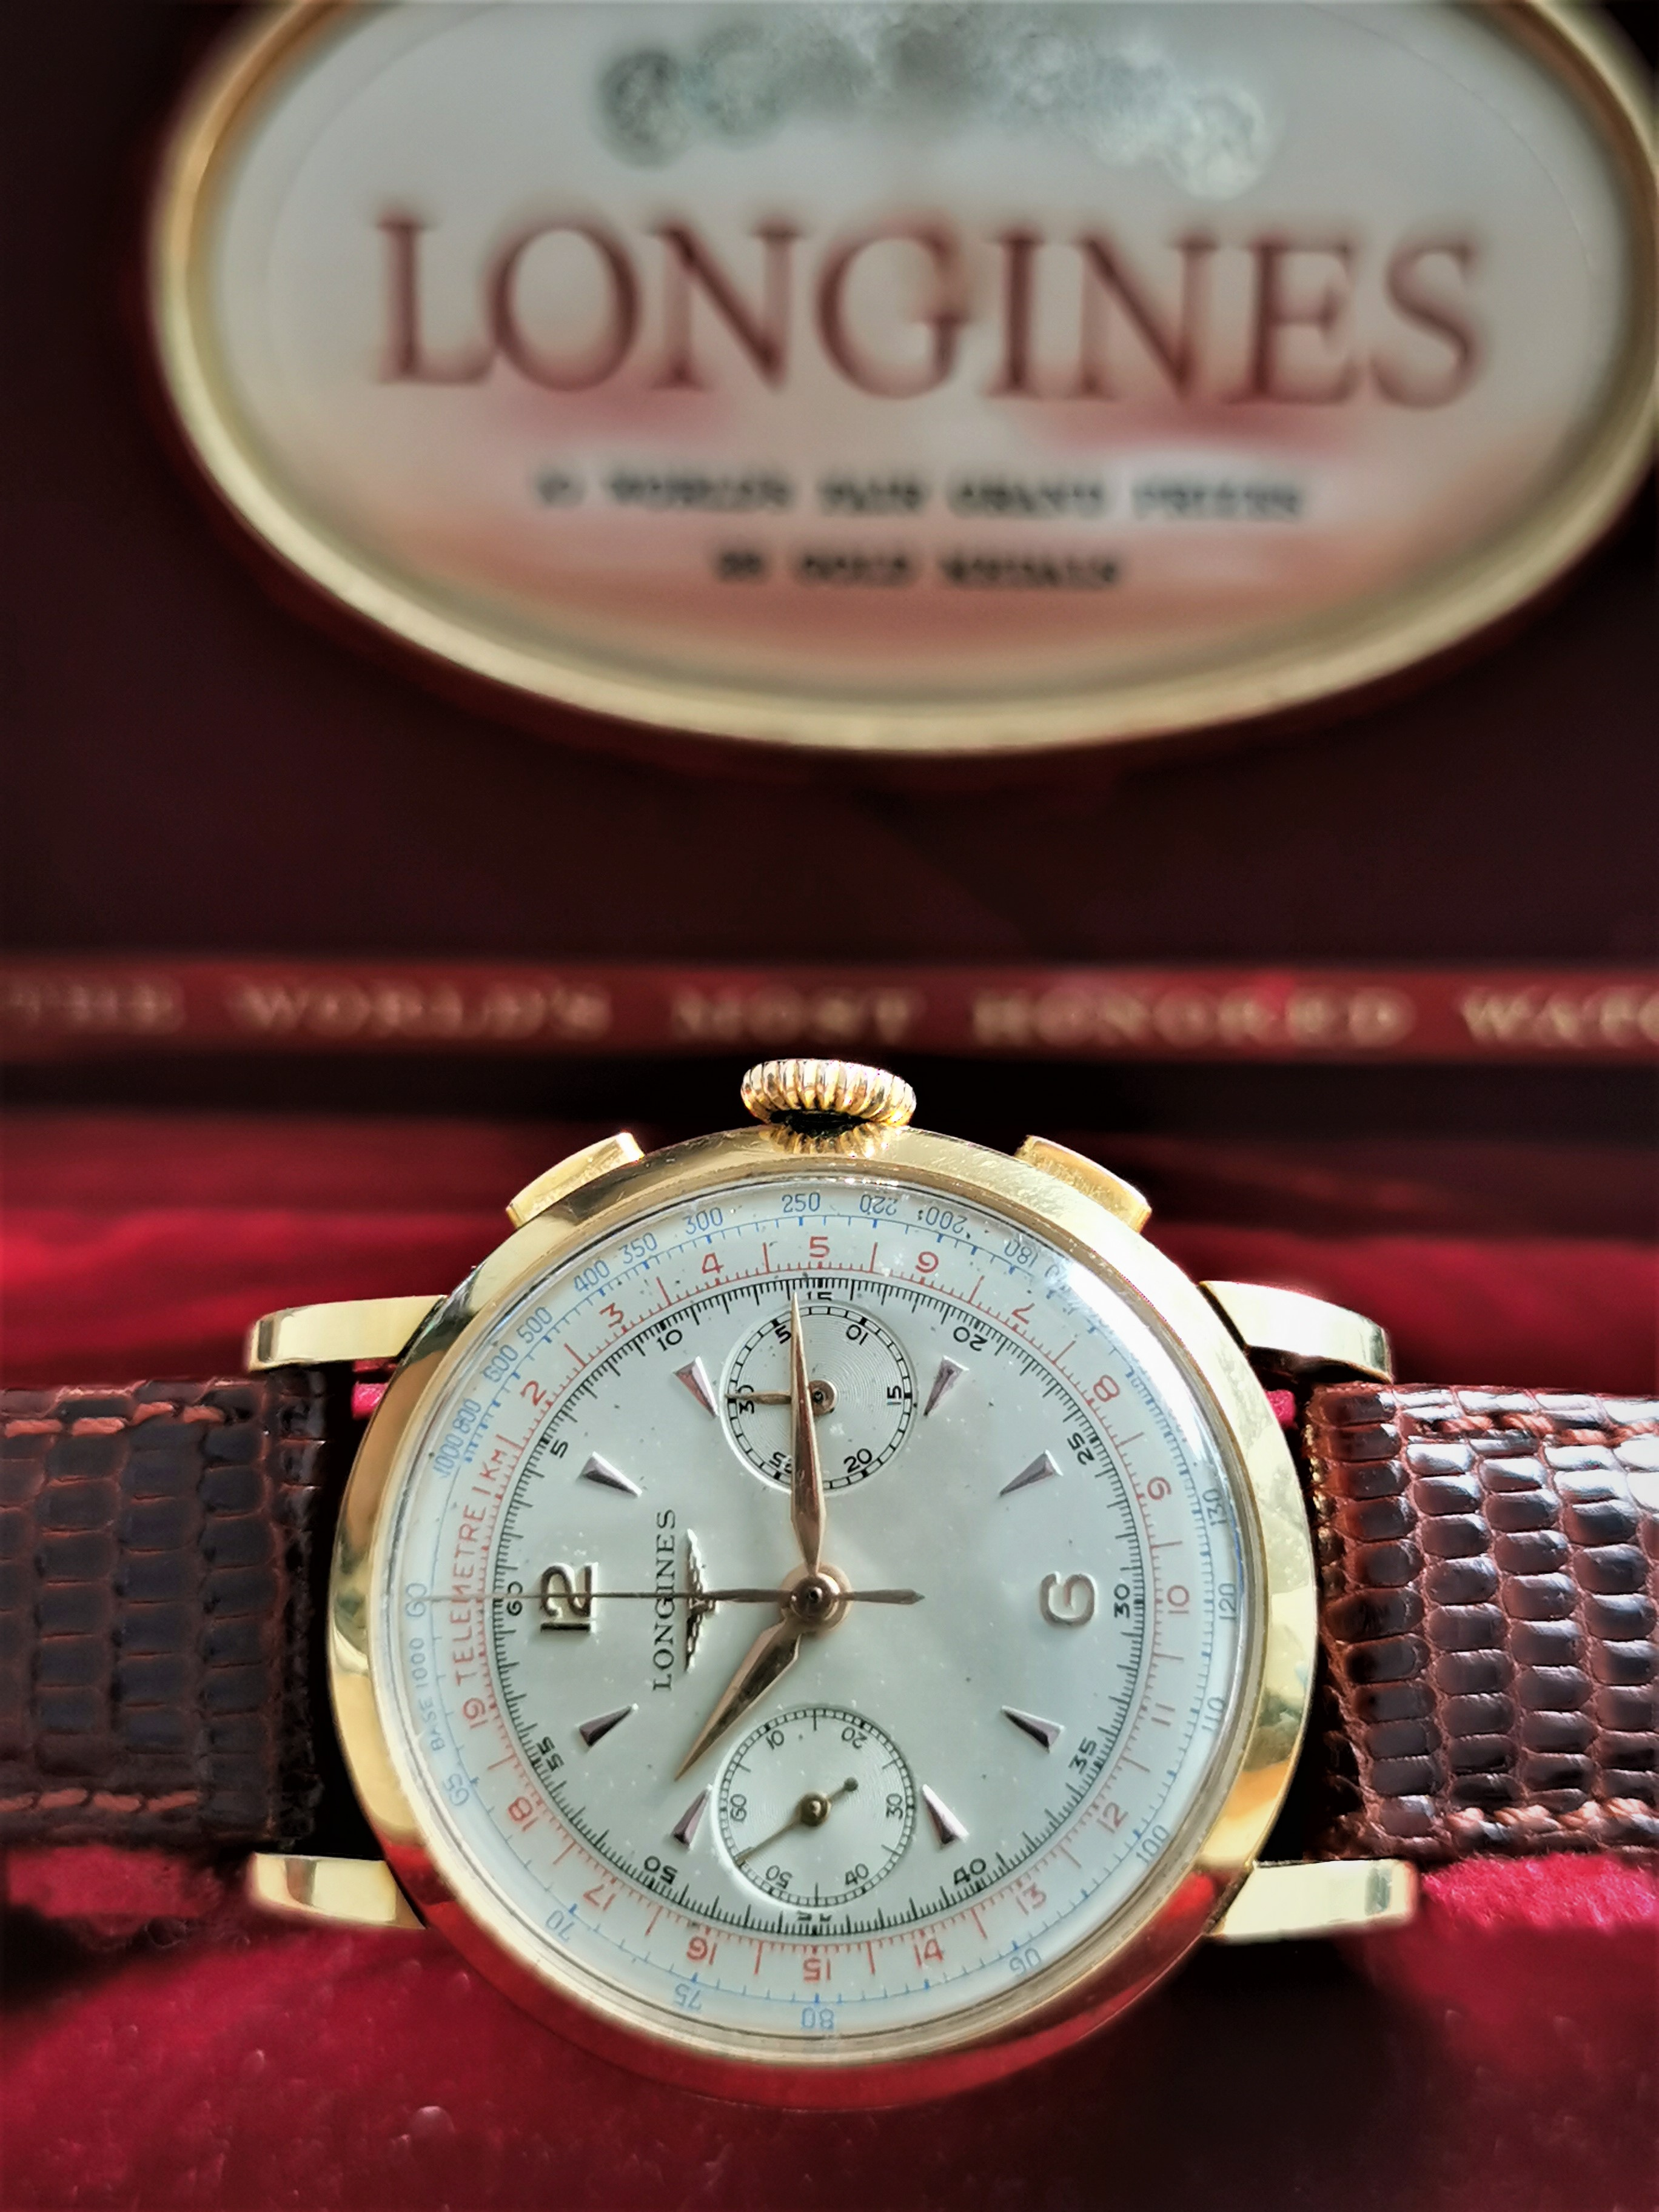 Longines 30CH Ref. 6234 18 kt gold yellow mm 37.5 top condition - box | San Giorgio a Cremano